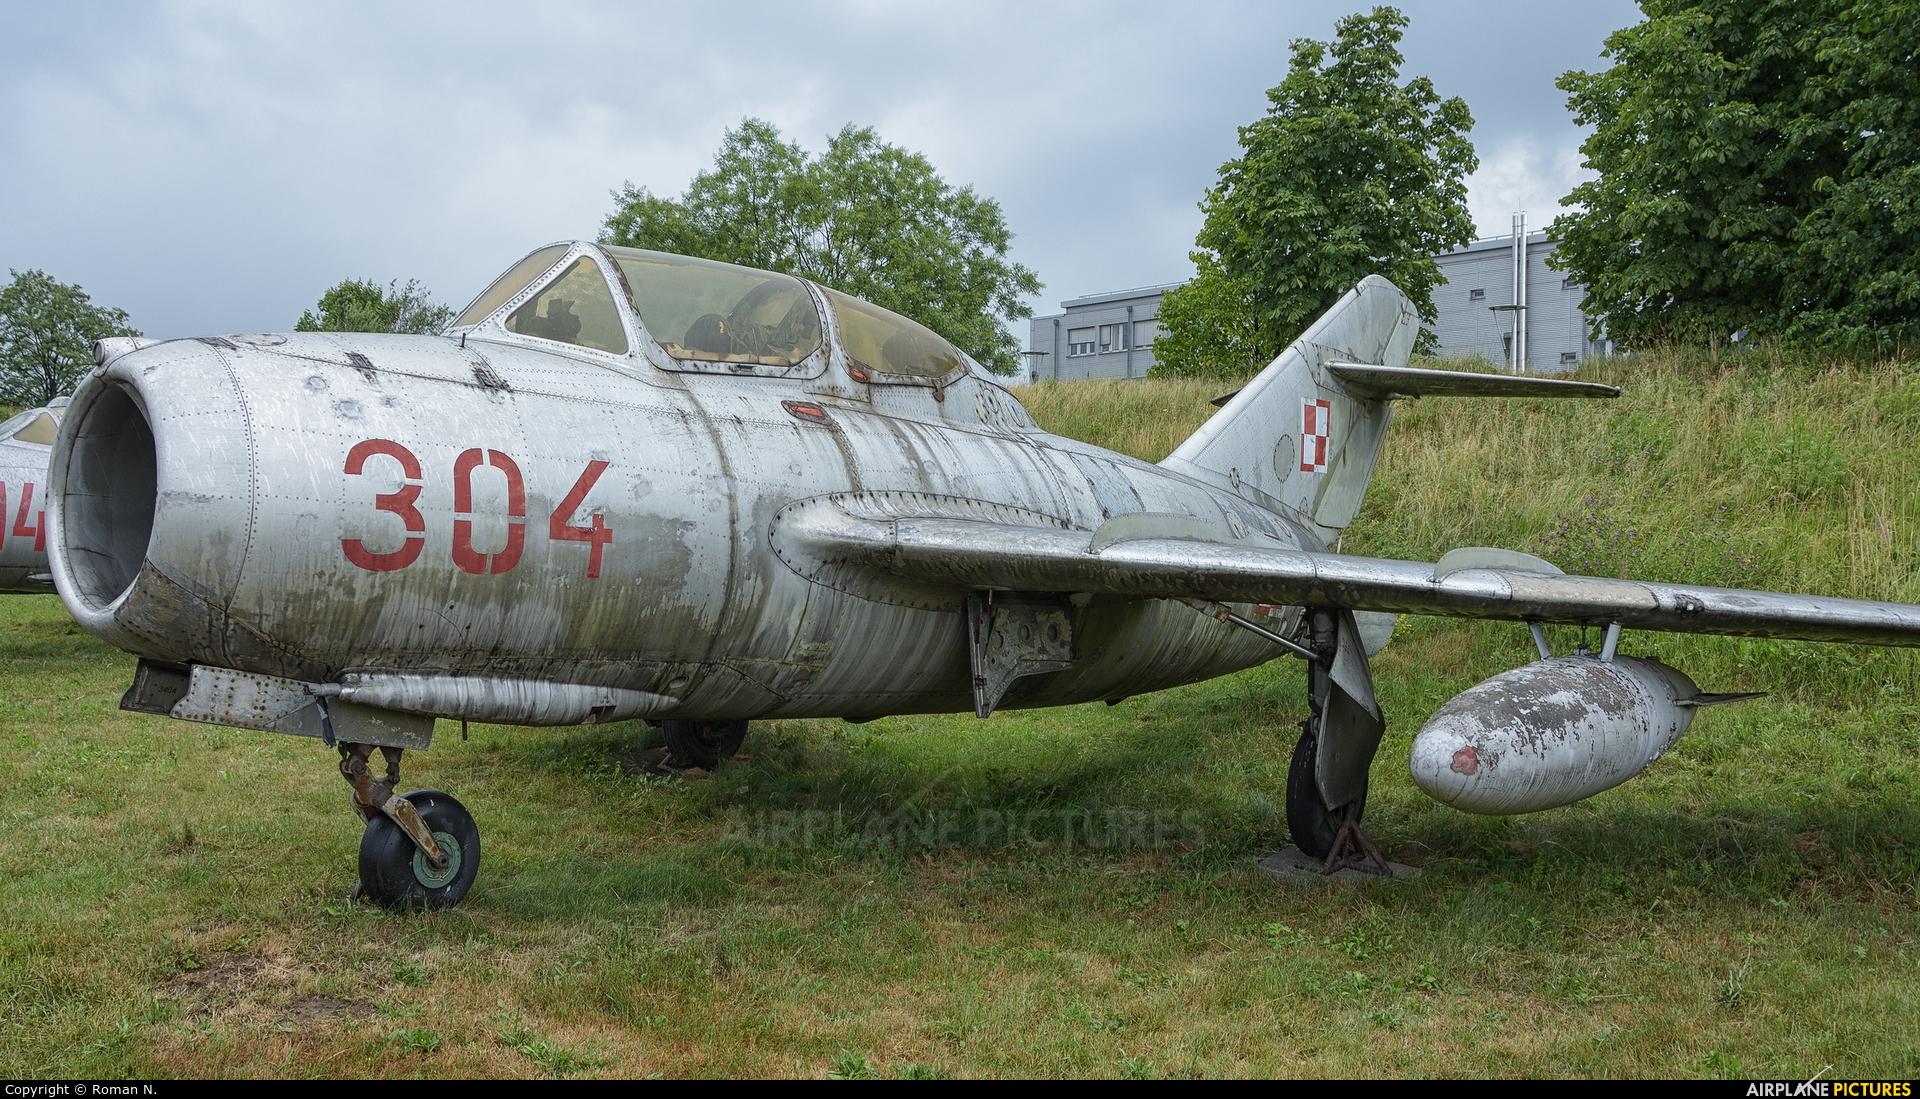 Poland - Air Force 304 aircraft at Kraków, Rakowice Czyżyny - Museum of Polish Aviation